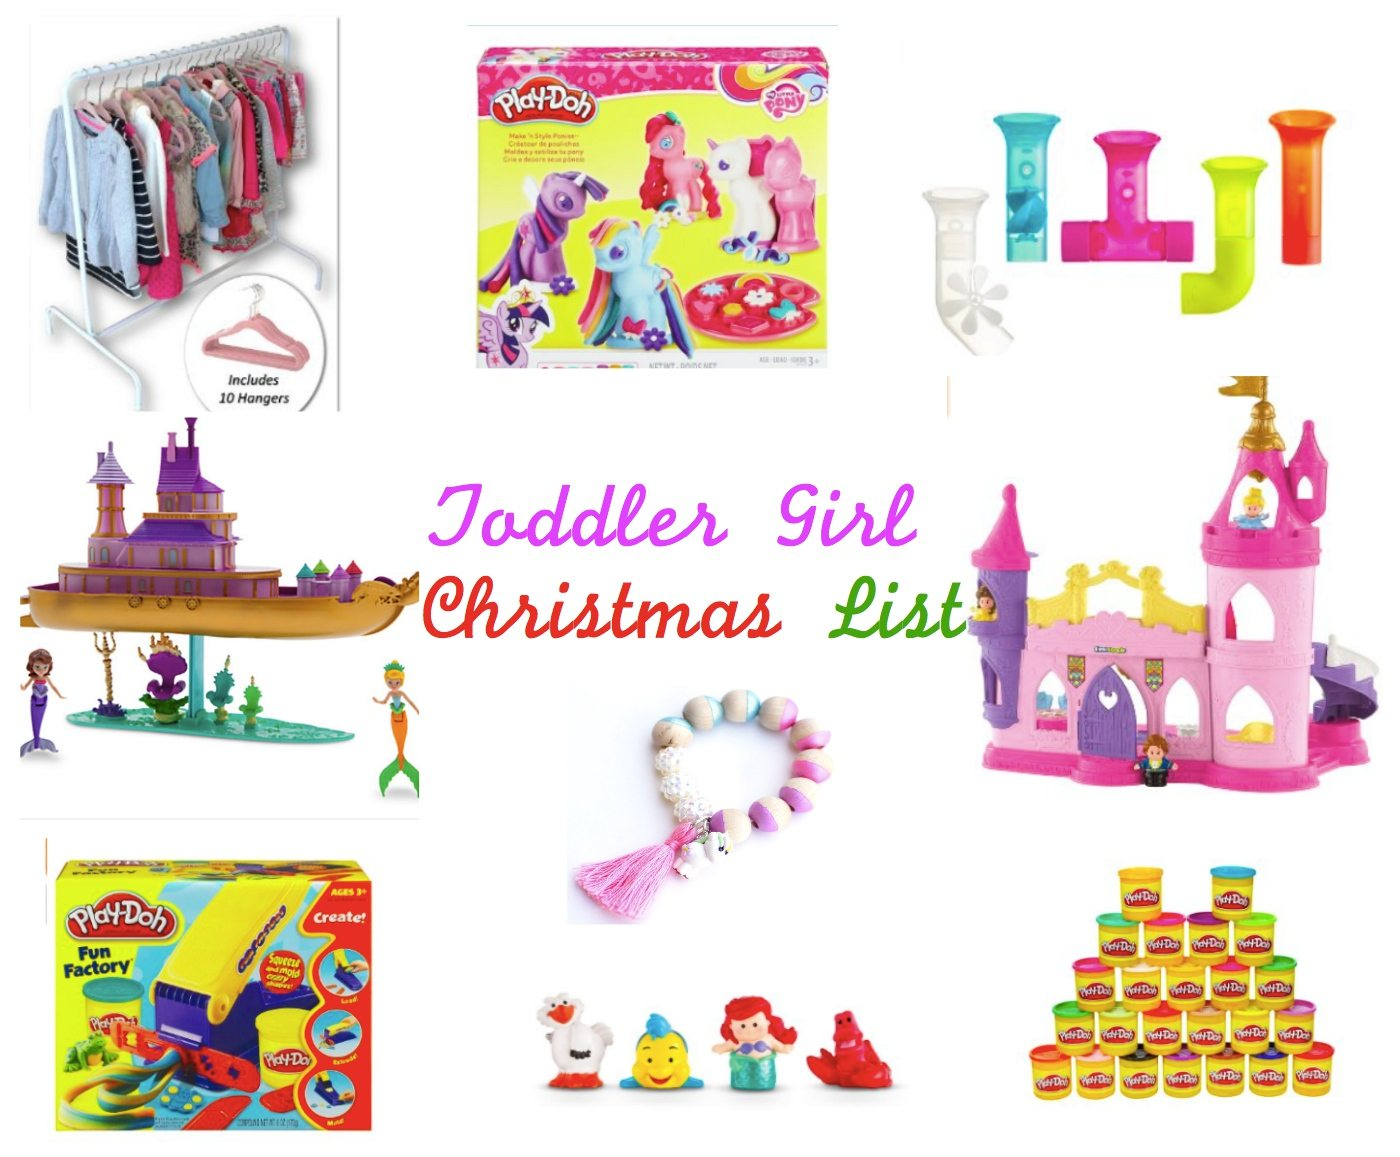 Christmas Wish List Ideas.Toddler Girl Christmas Wish List Ideas Veronika S Blushing